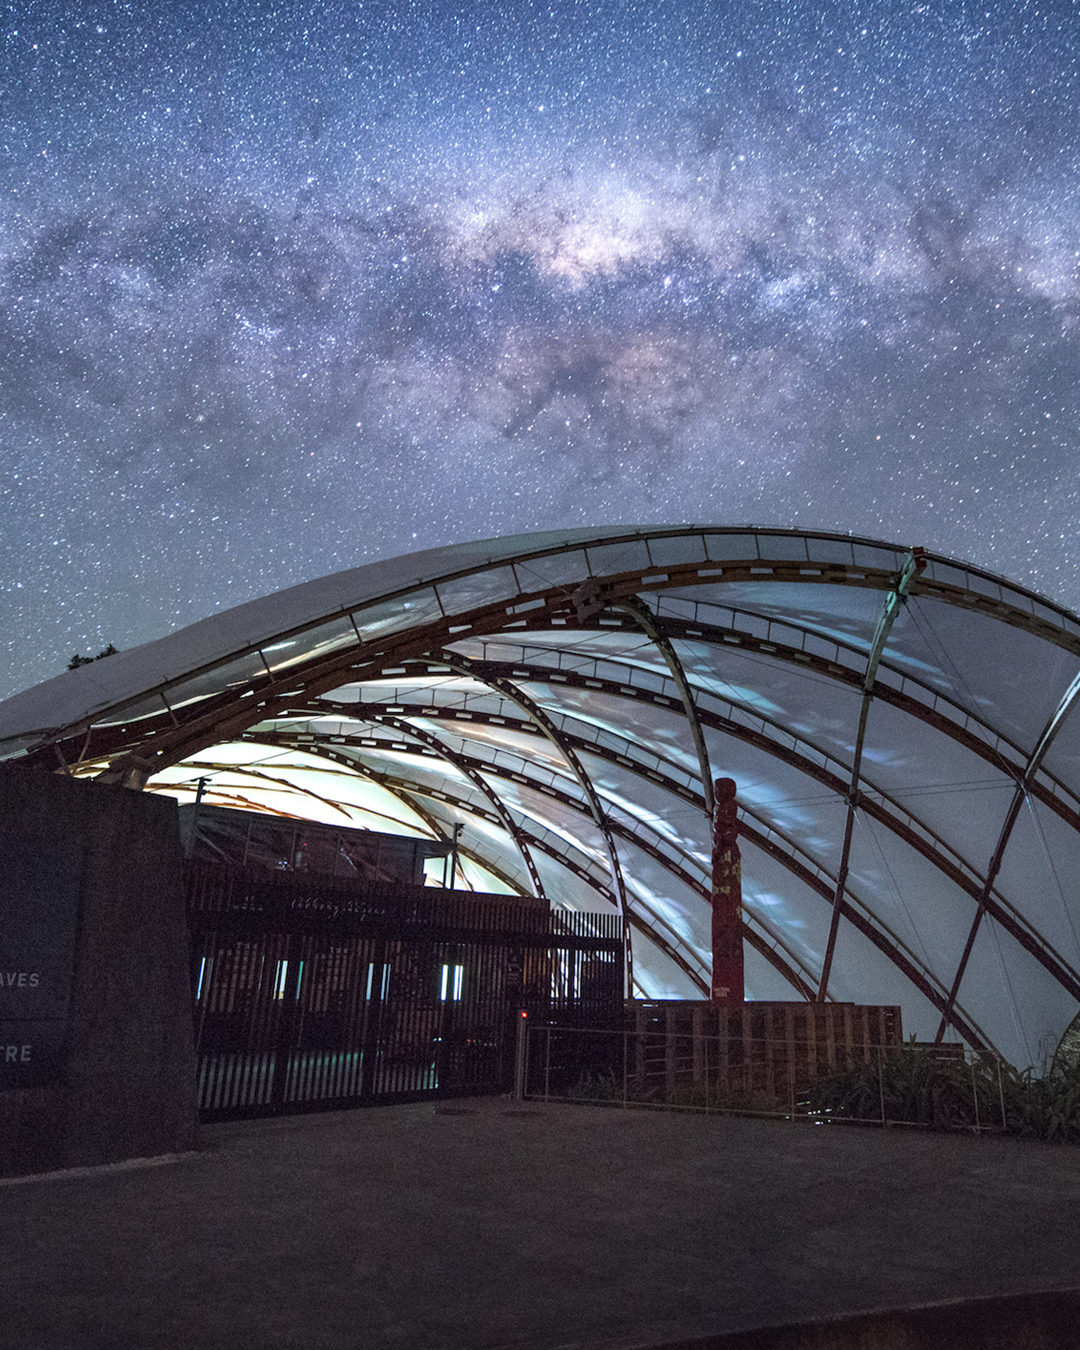 Waitomo Caves Township under a starlit sky.